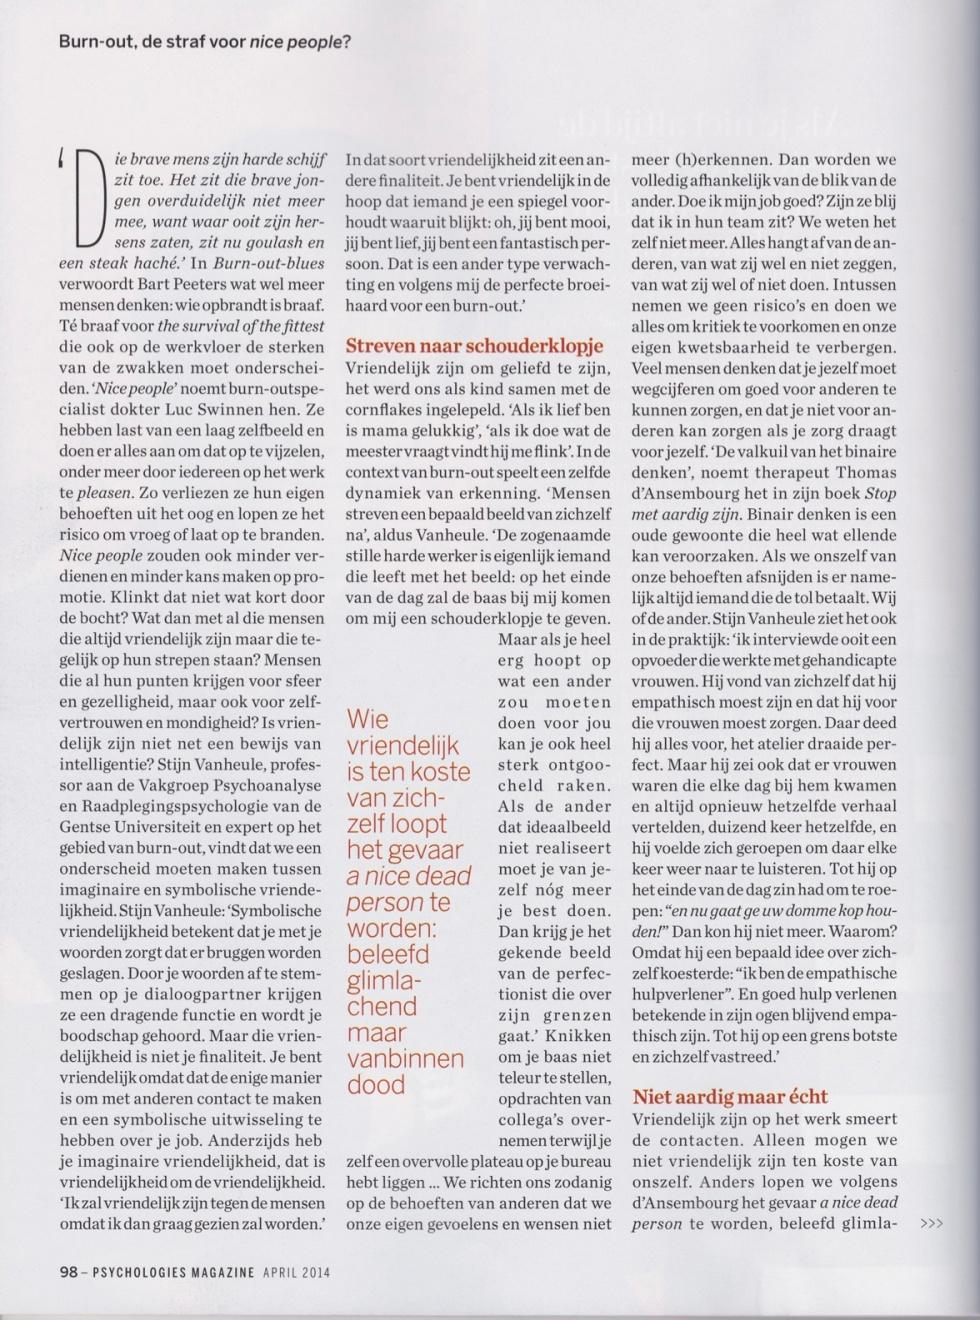 Psychologies p3